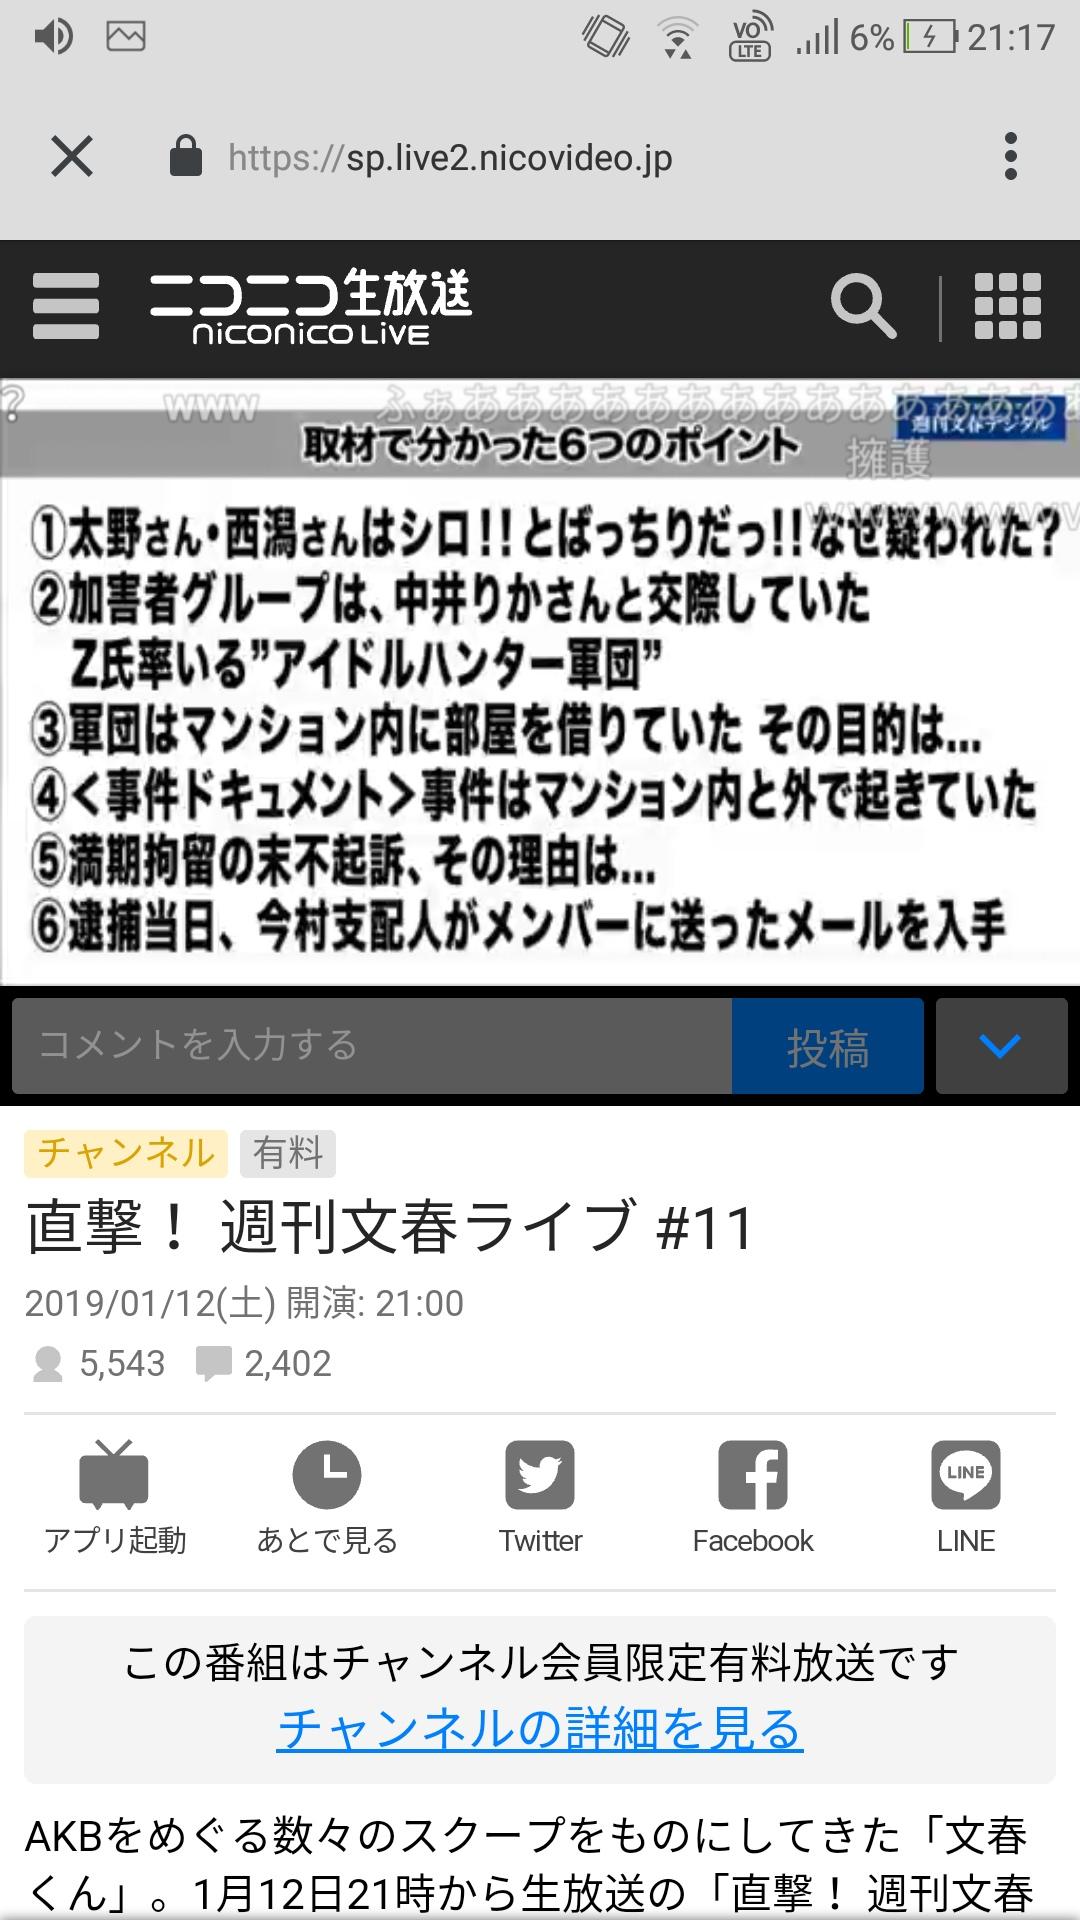 週刊文春ライブ NGT48山口真帆暴行事件